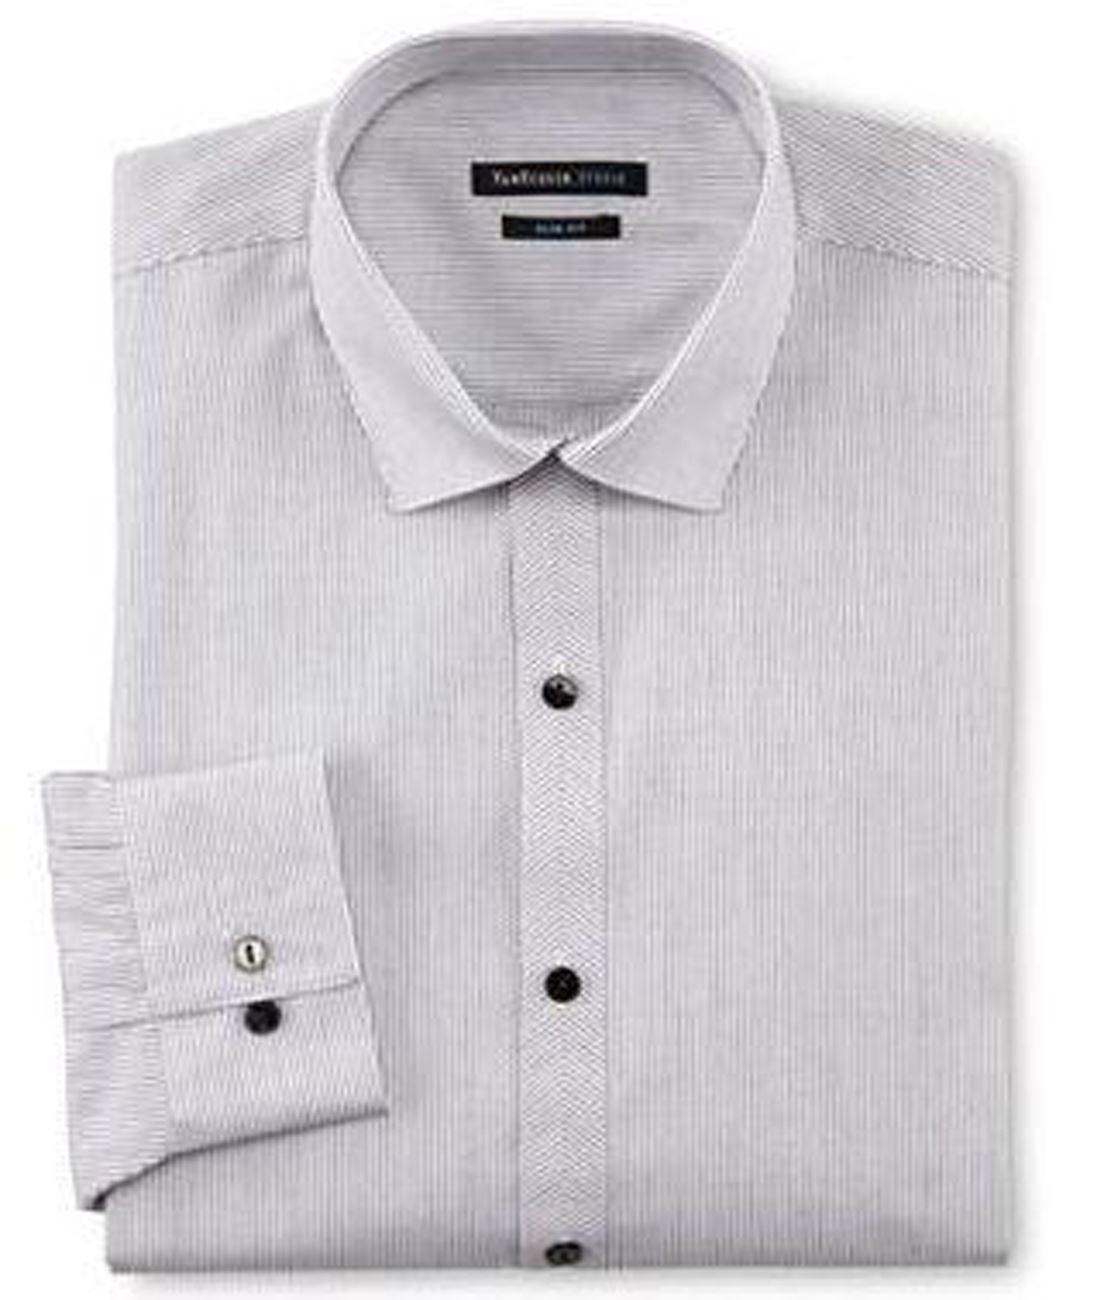 Mens shirt van heusen slim fit cotton rich easycare long for Van heusen dress shirts